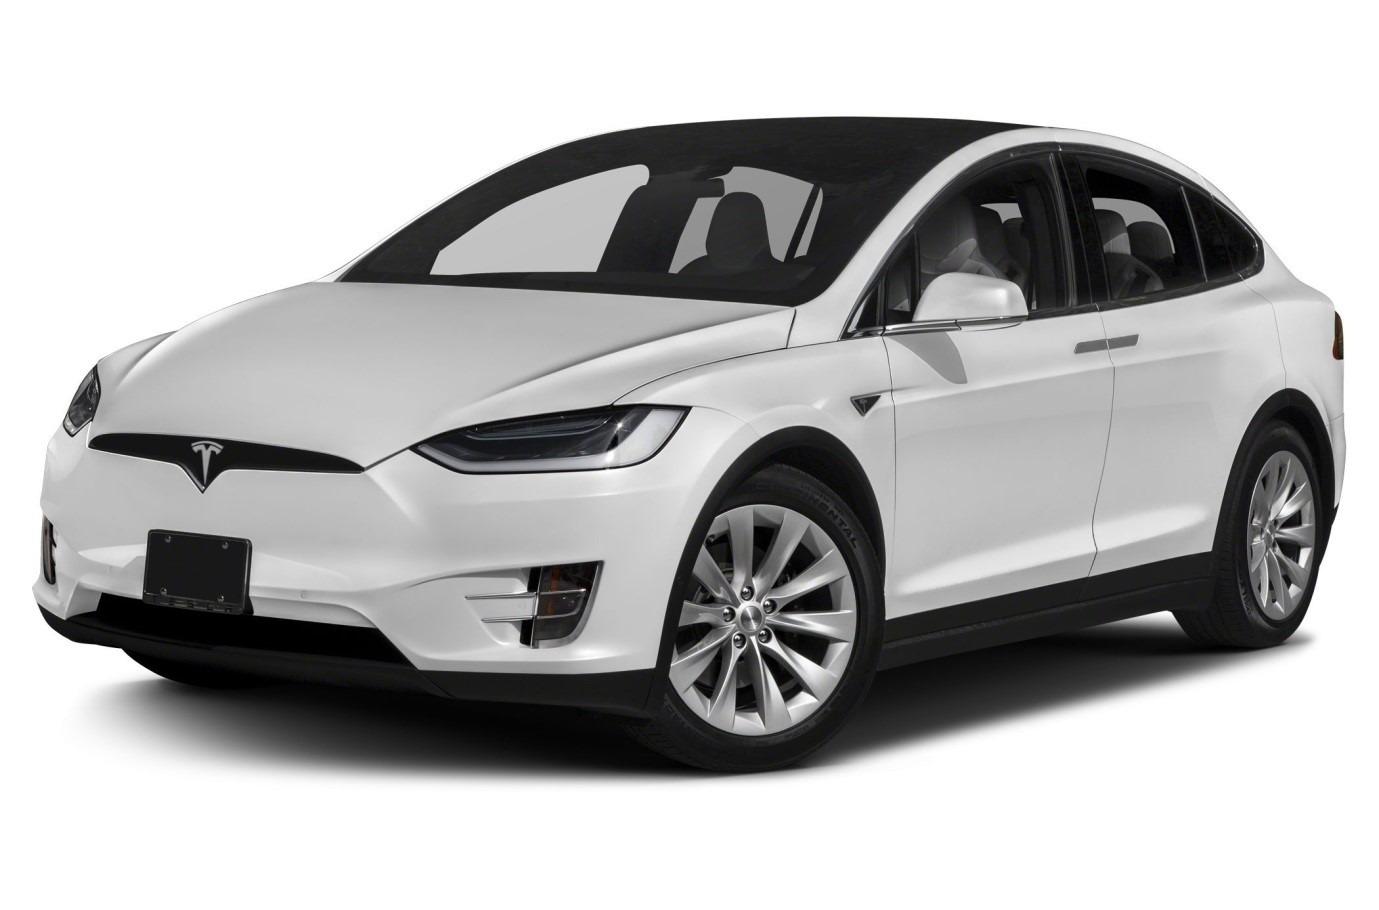 2018 Tesla Model X Full Review: The Future Of Tesla